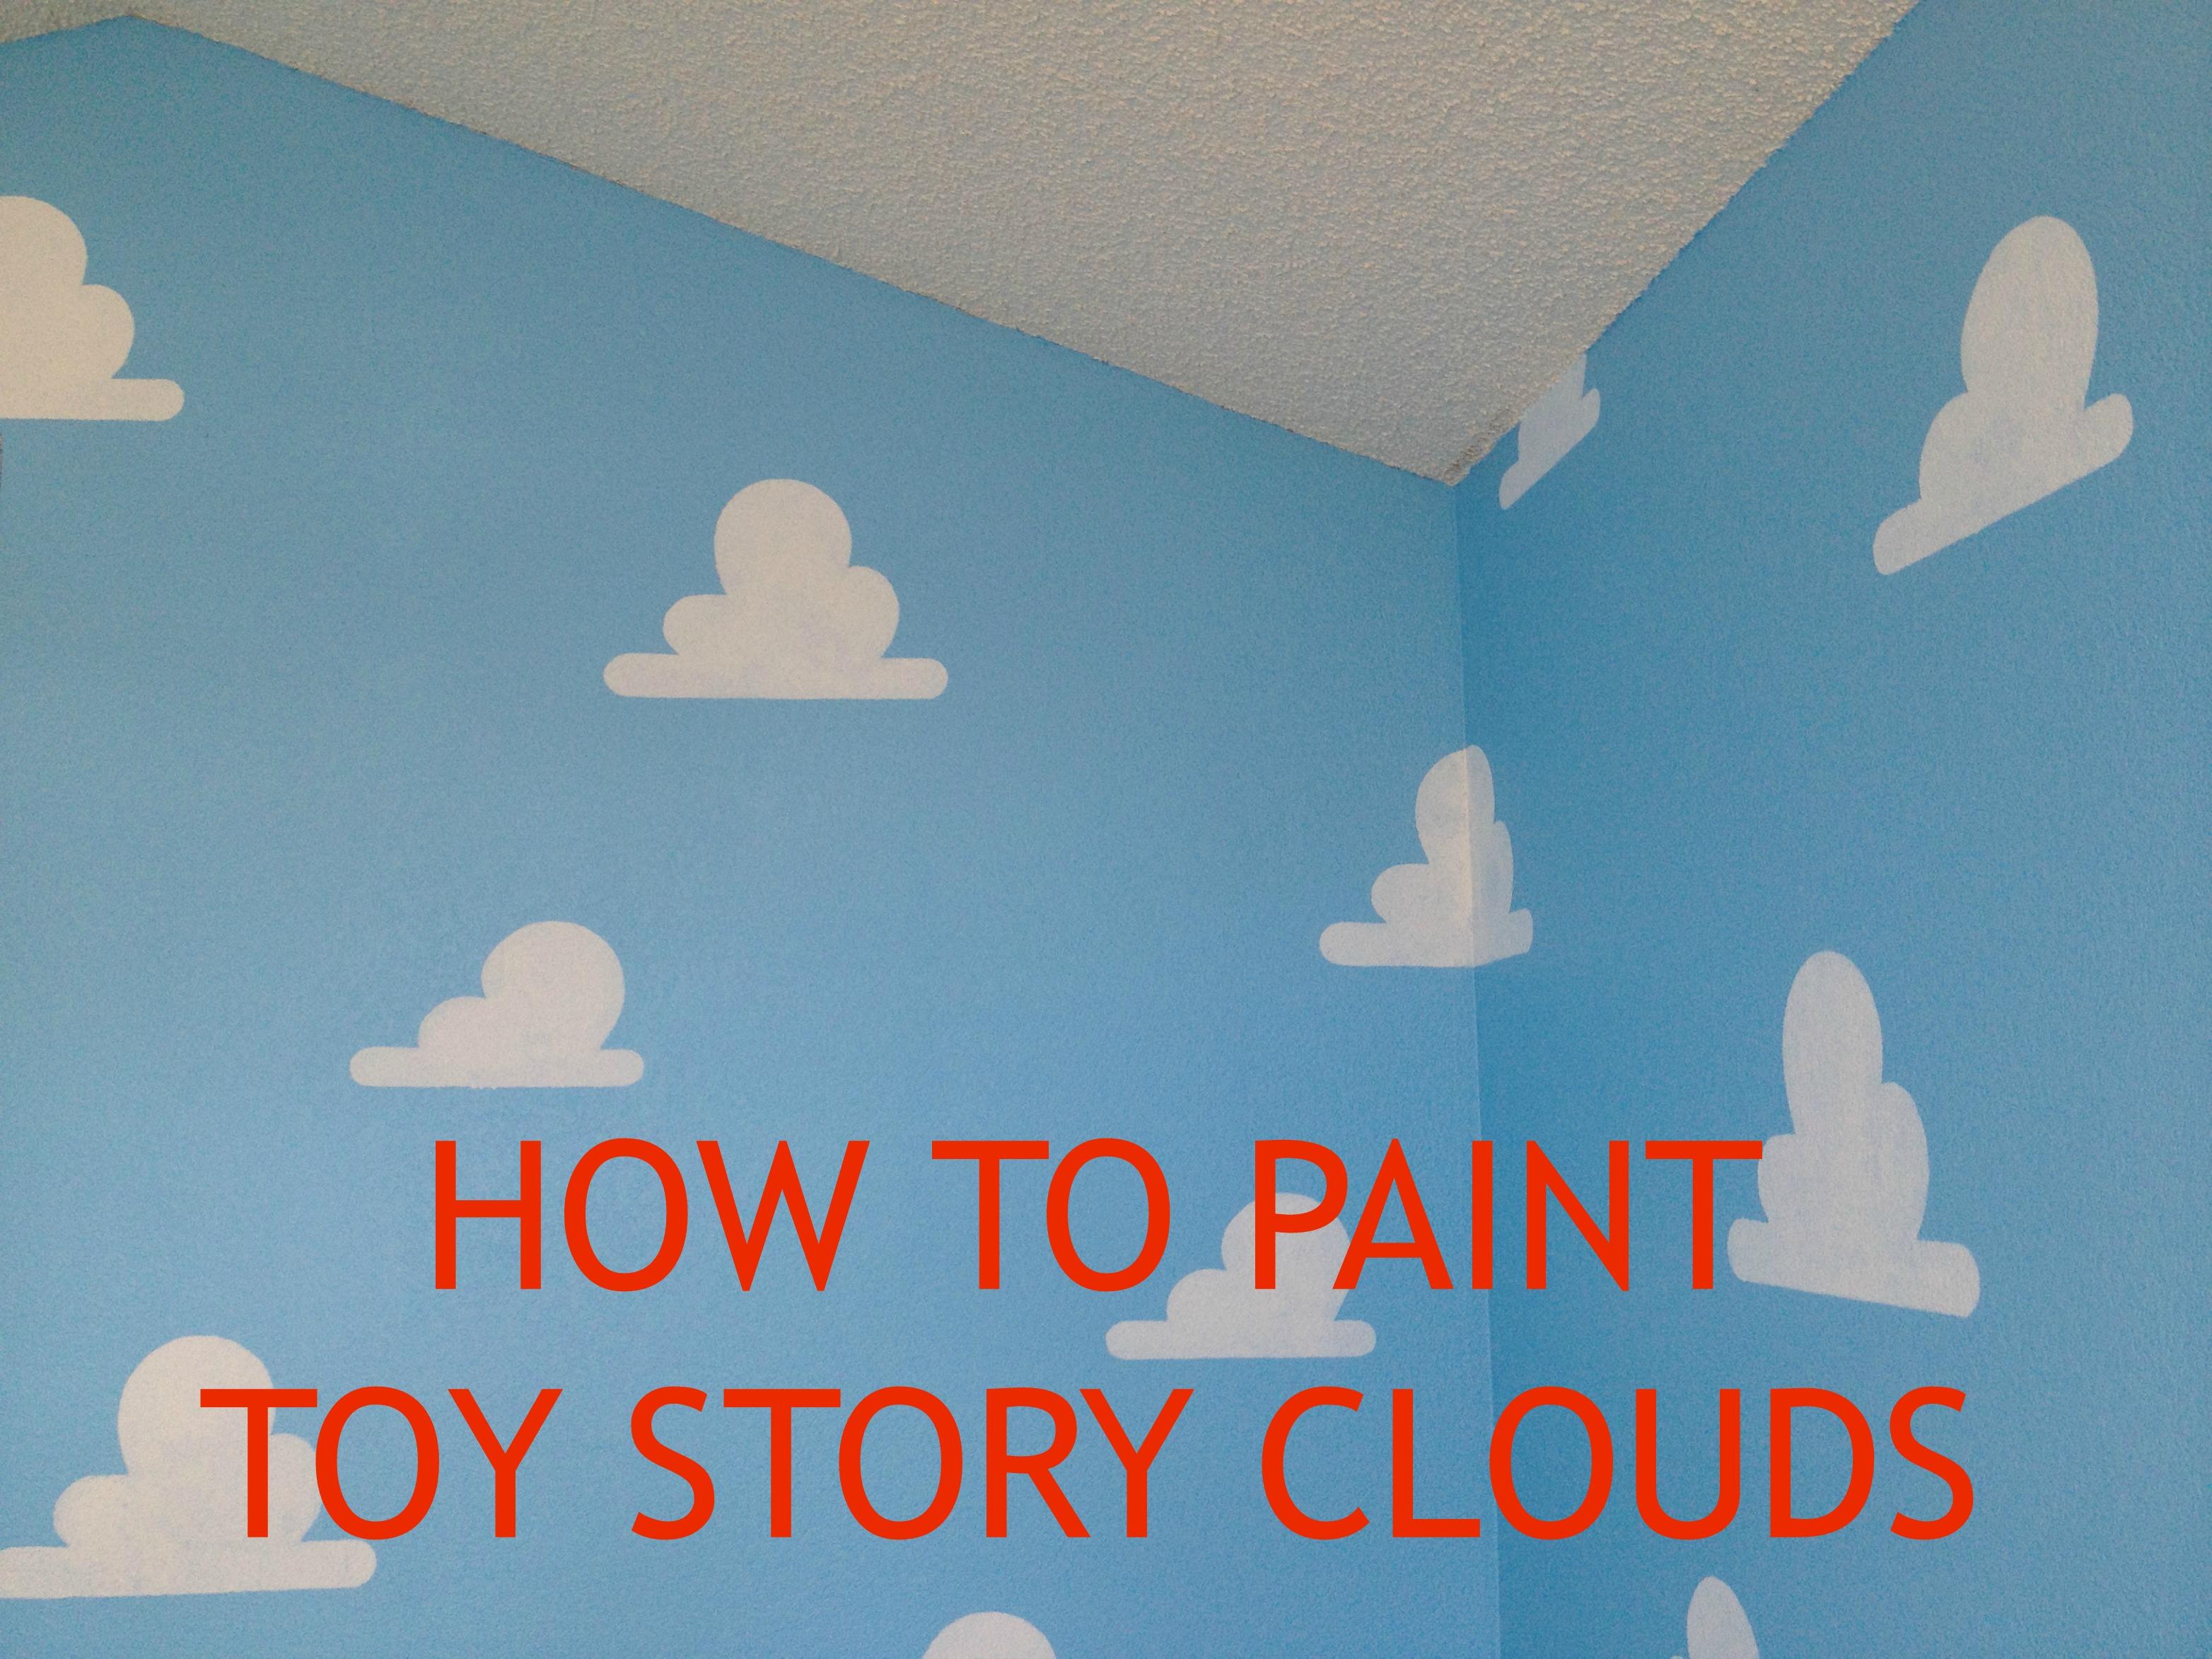 How to make cloud walls terraria